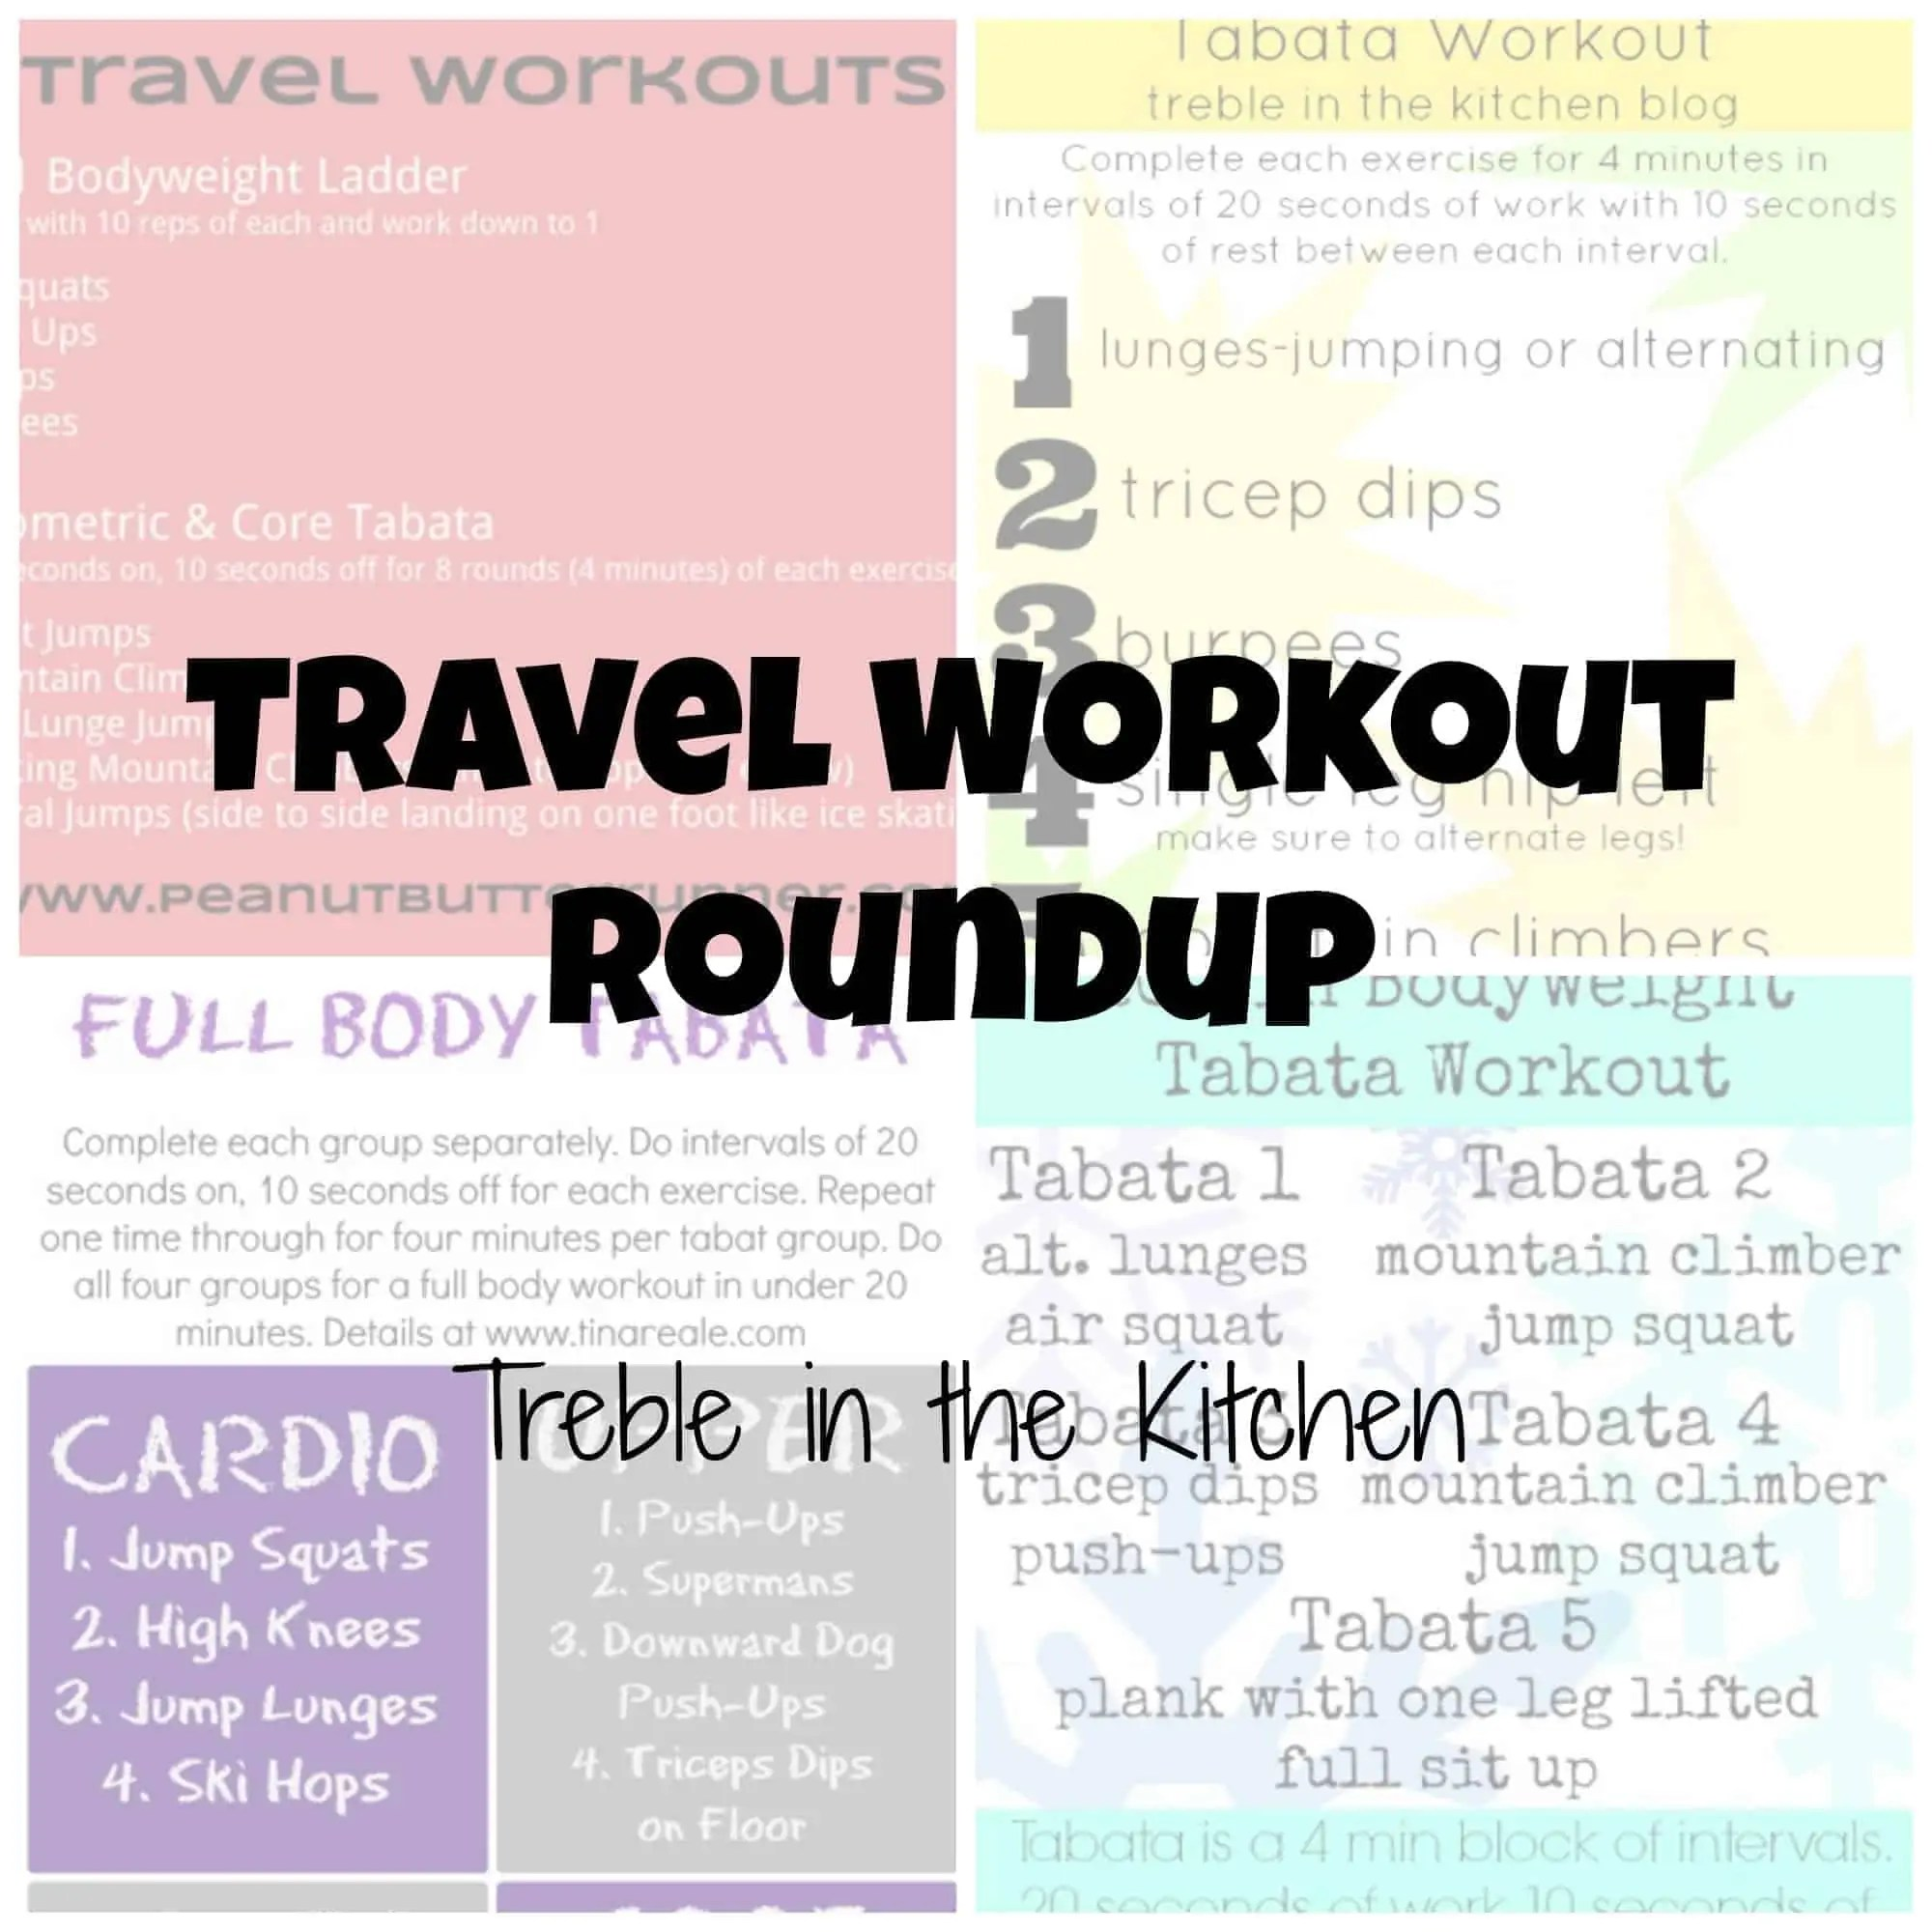 Travel Workout Roundup via Treble in the Kitchen